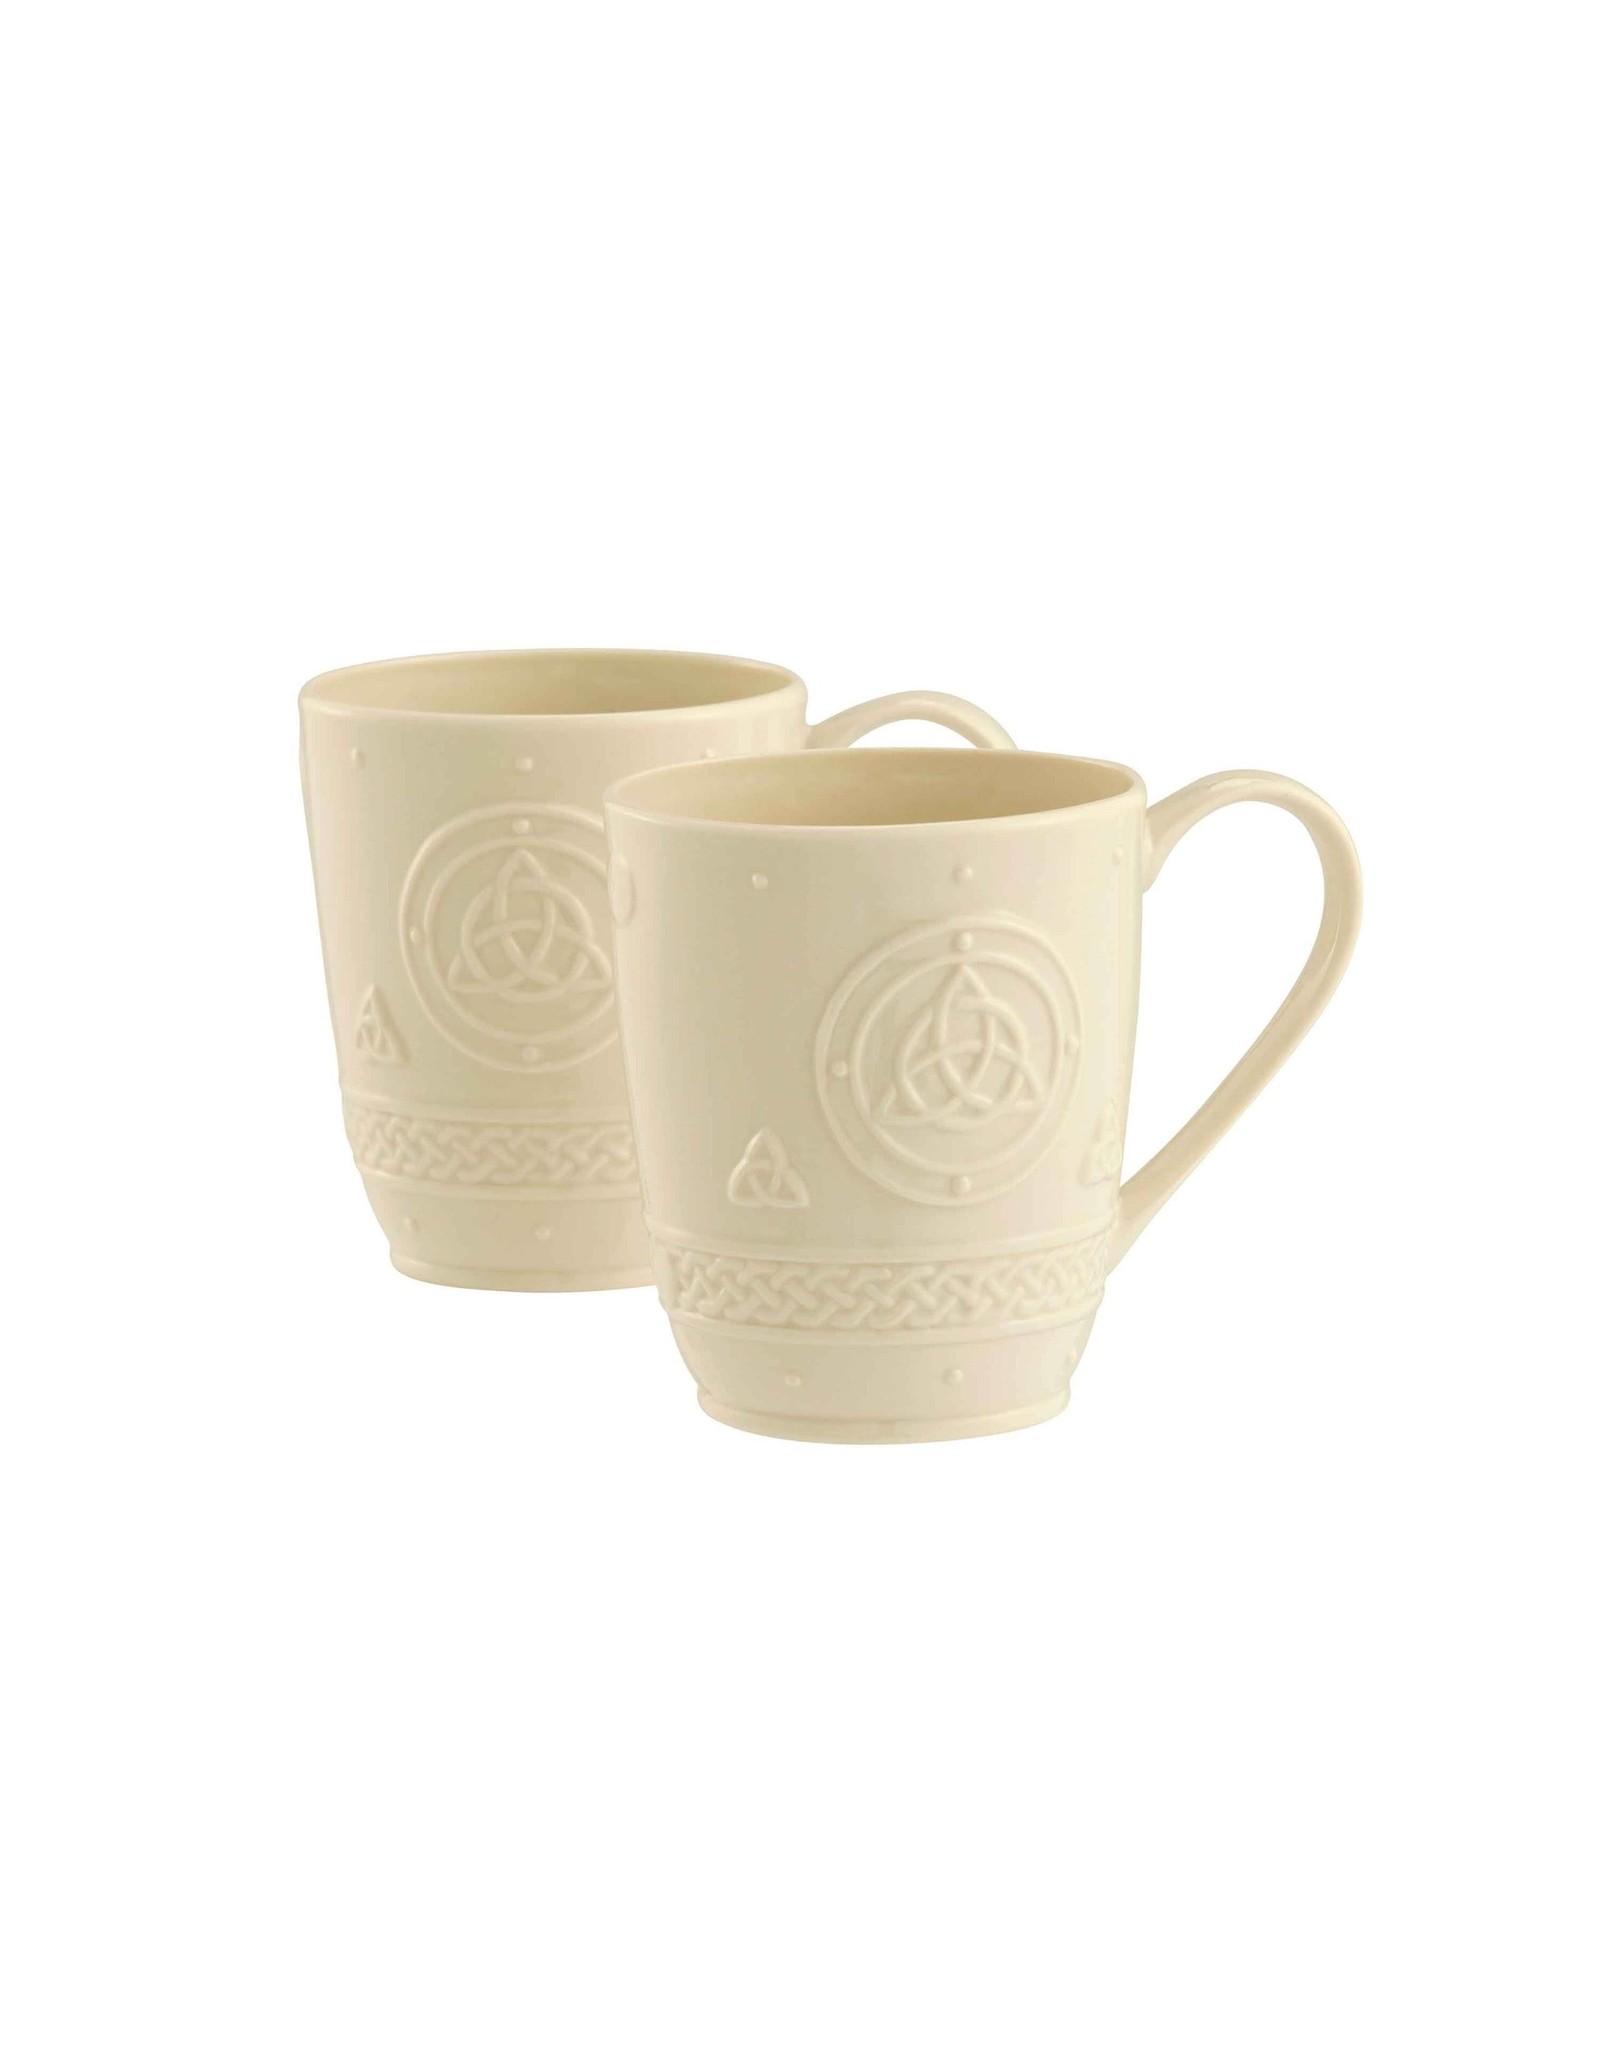 Belleek Belleek Celtic 10 oz Mugs Set of 2